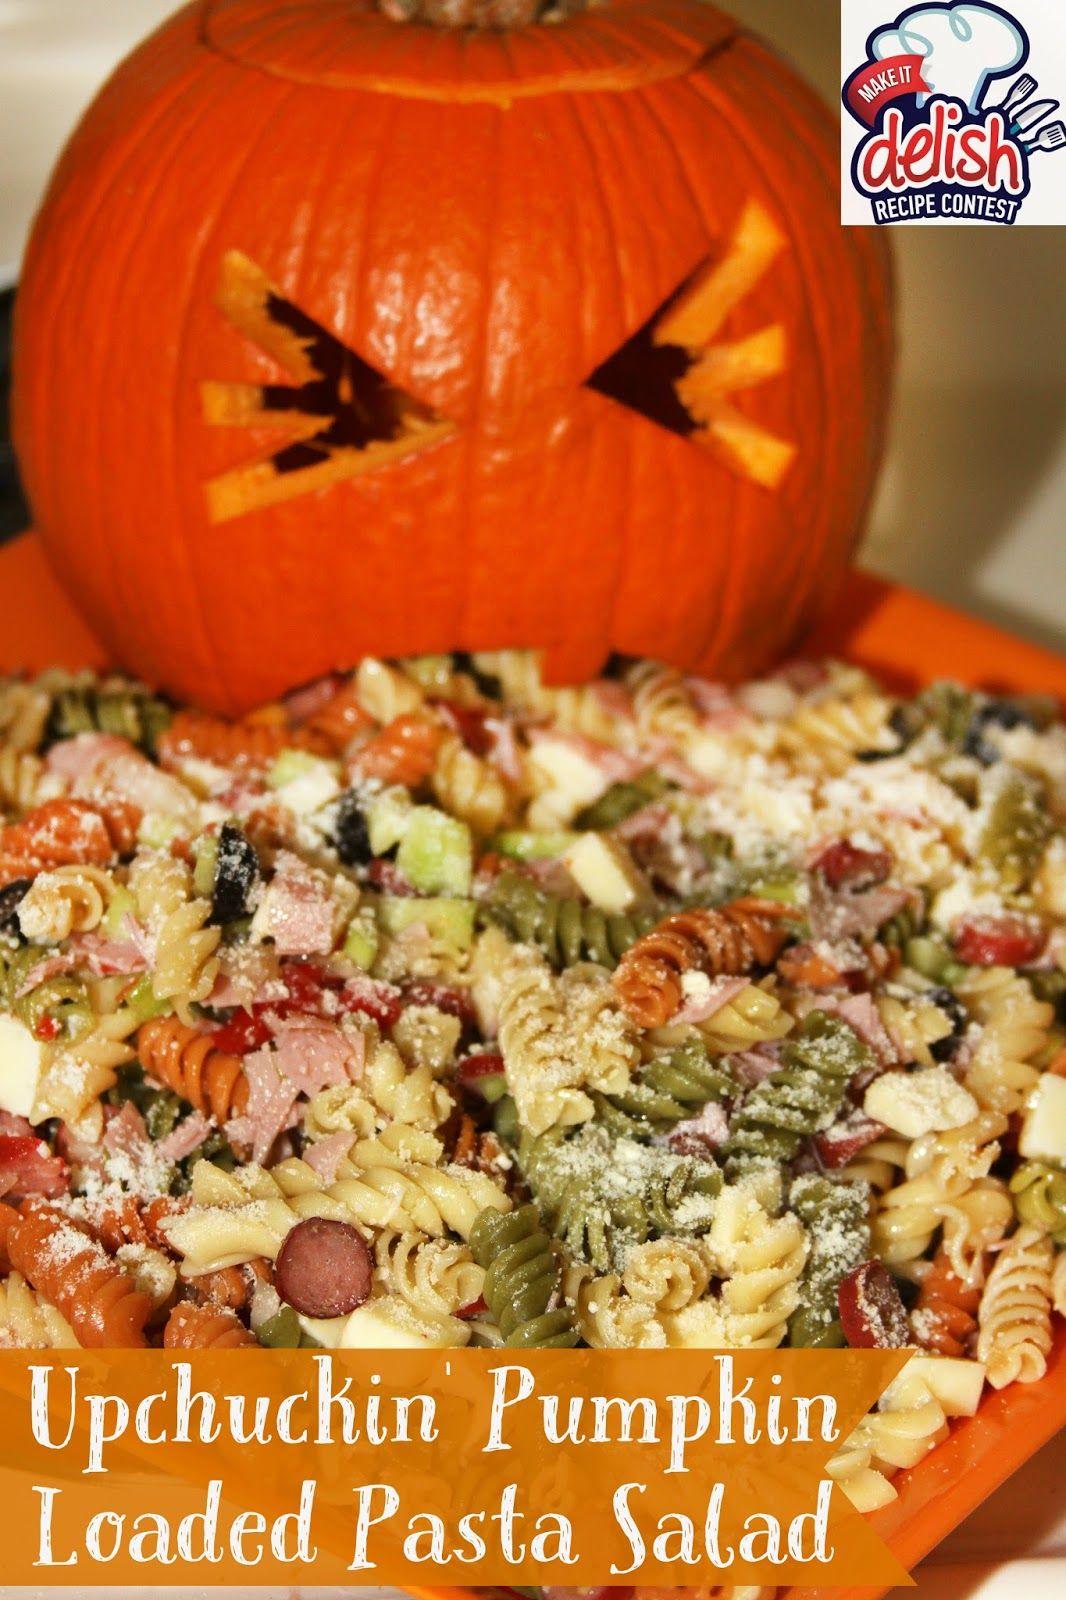 UpChuckin' Pumpkin Loaded Pasta Salad Recipe Halloween